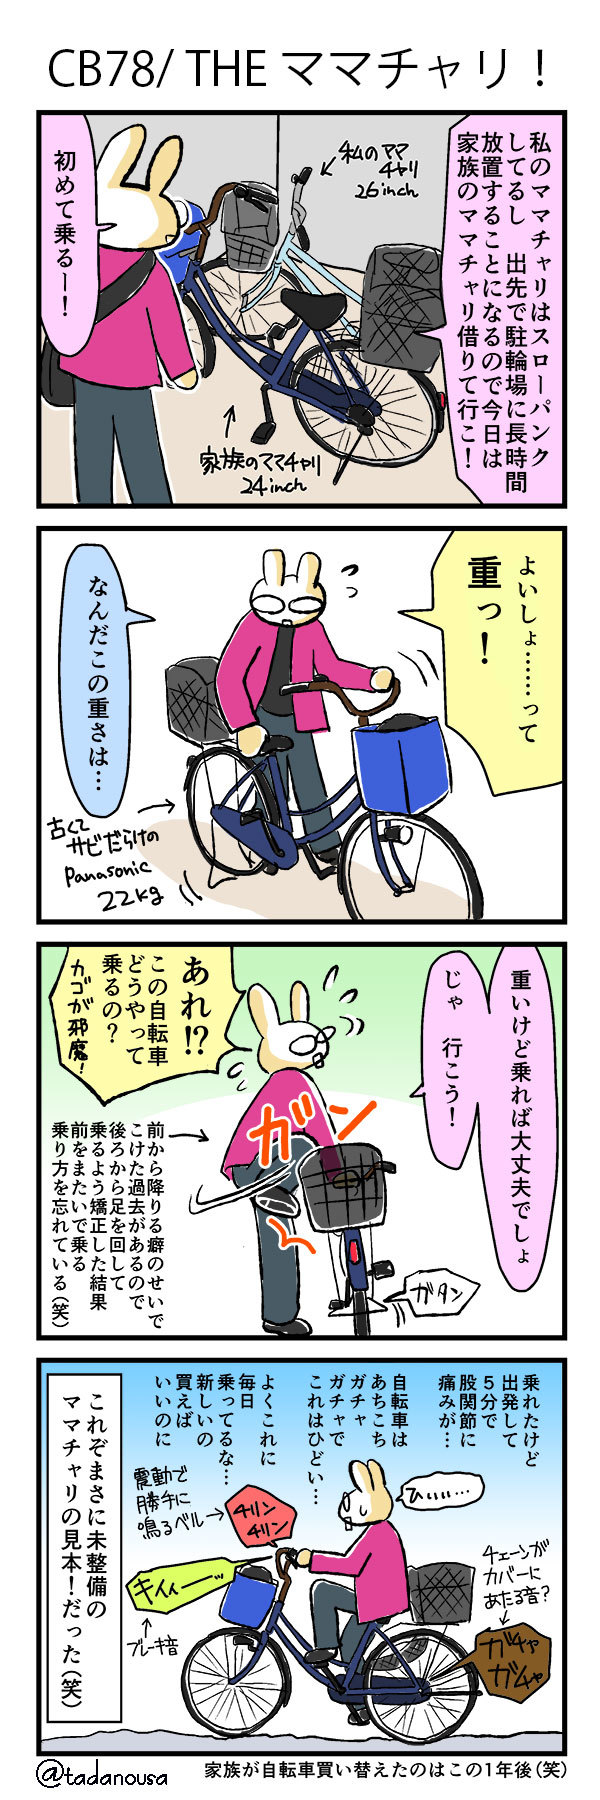 bike_4koma_kako118_s.jpg